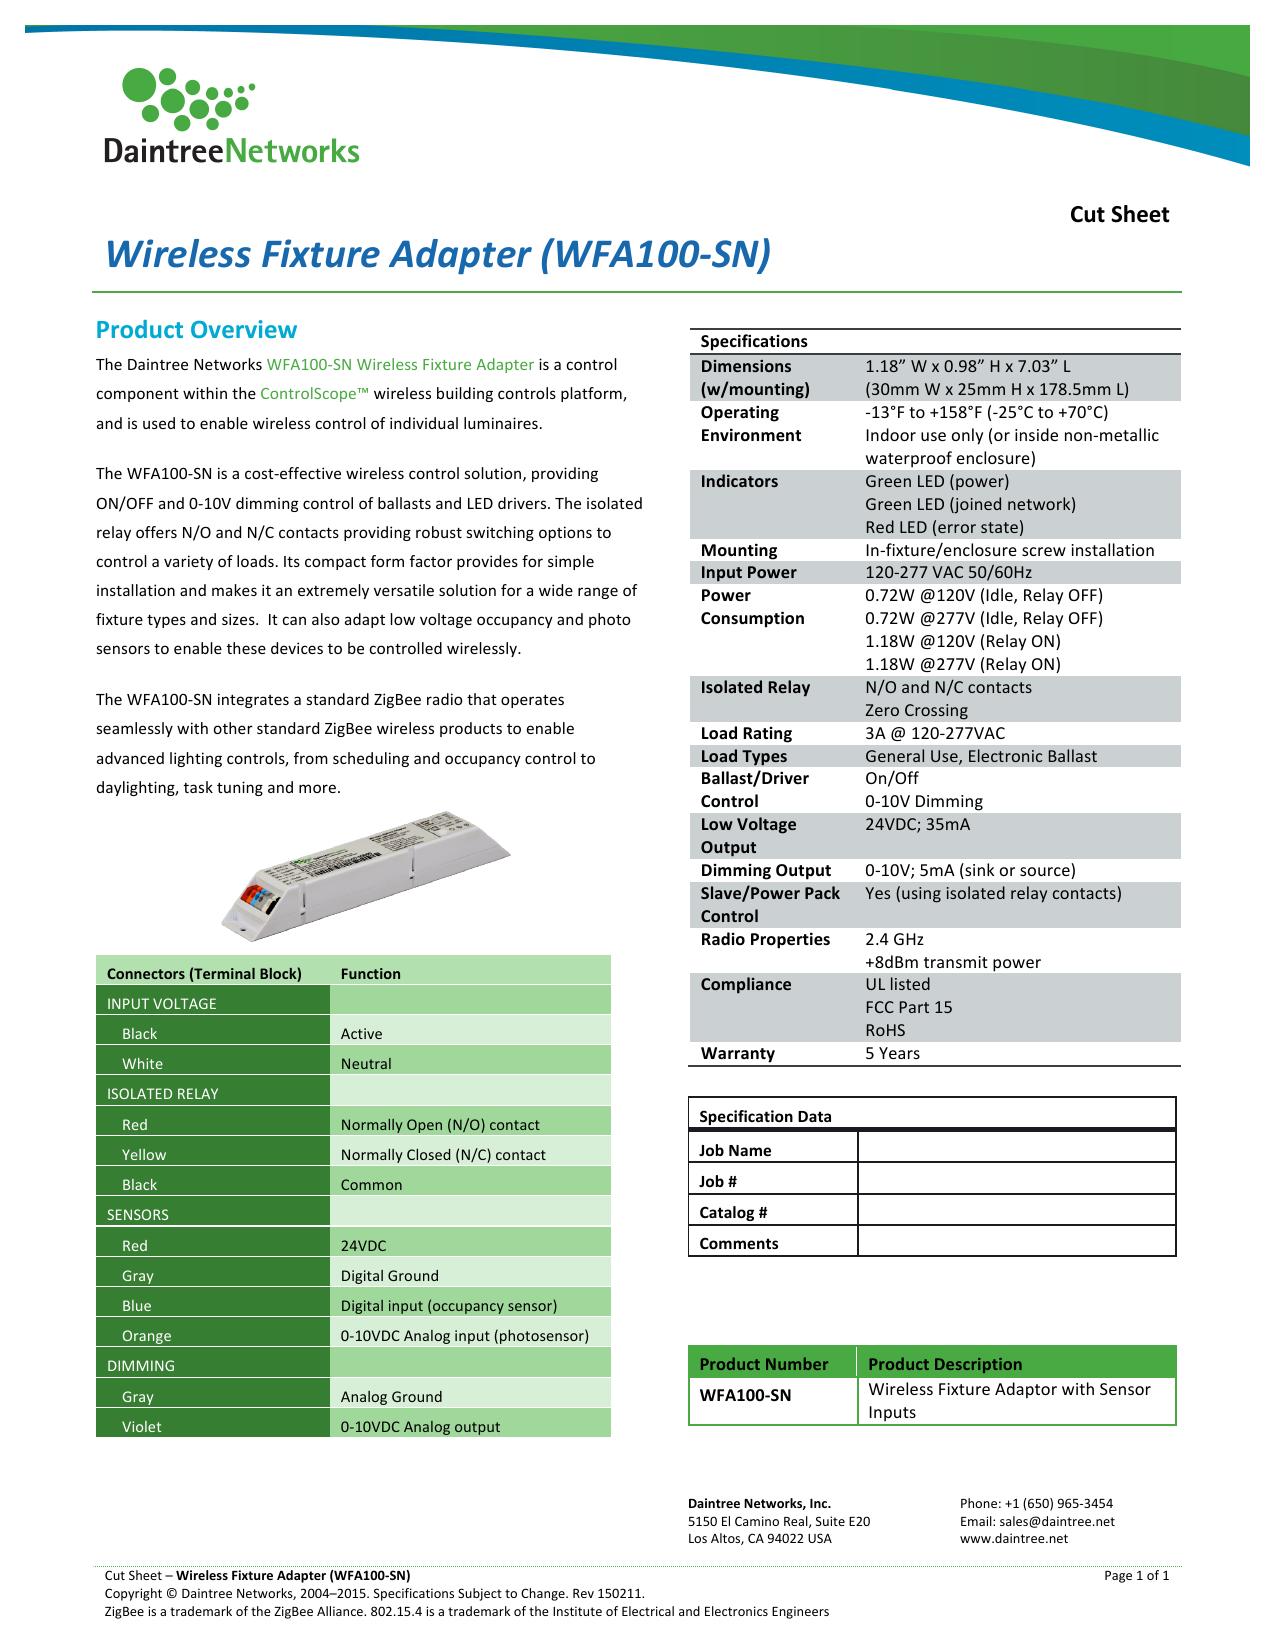 NEW DAINTREE  WFA100-SN WIRELESS FIXTURE ADAPTER